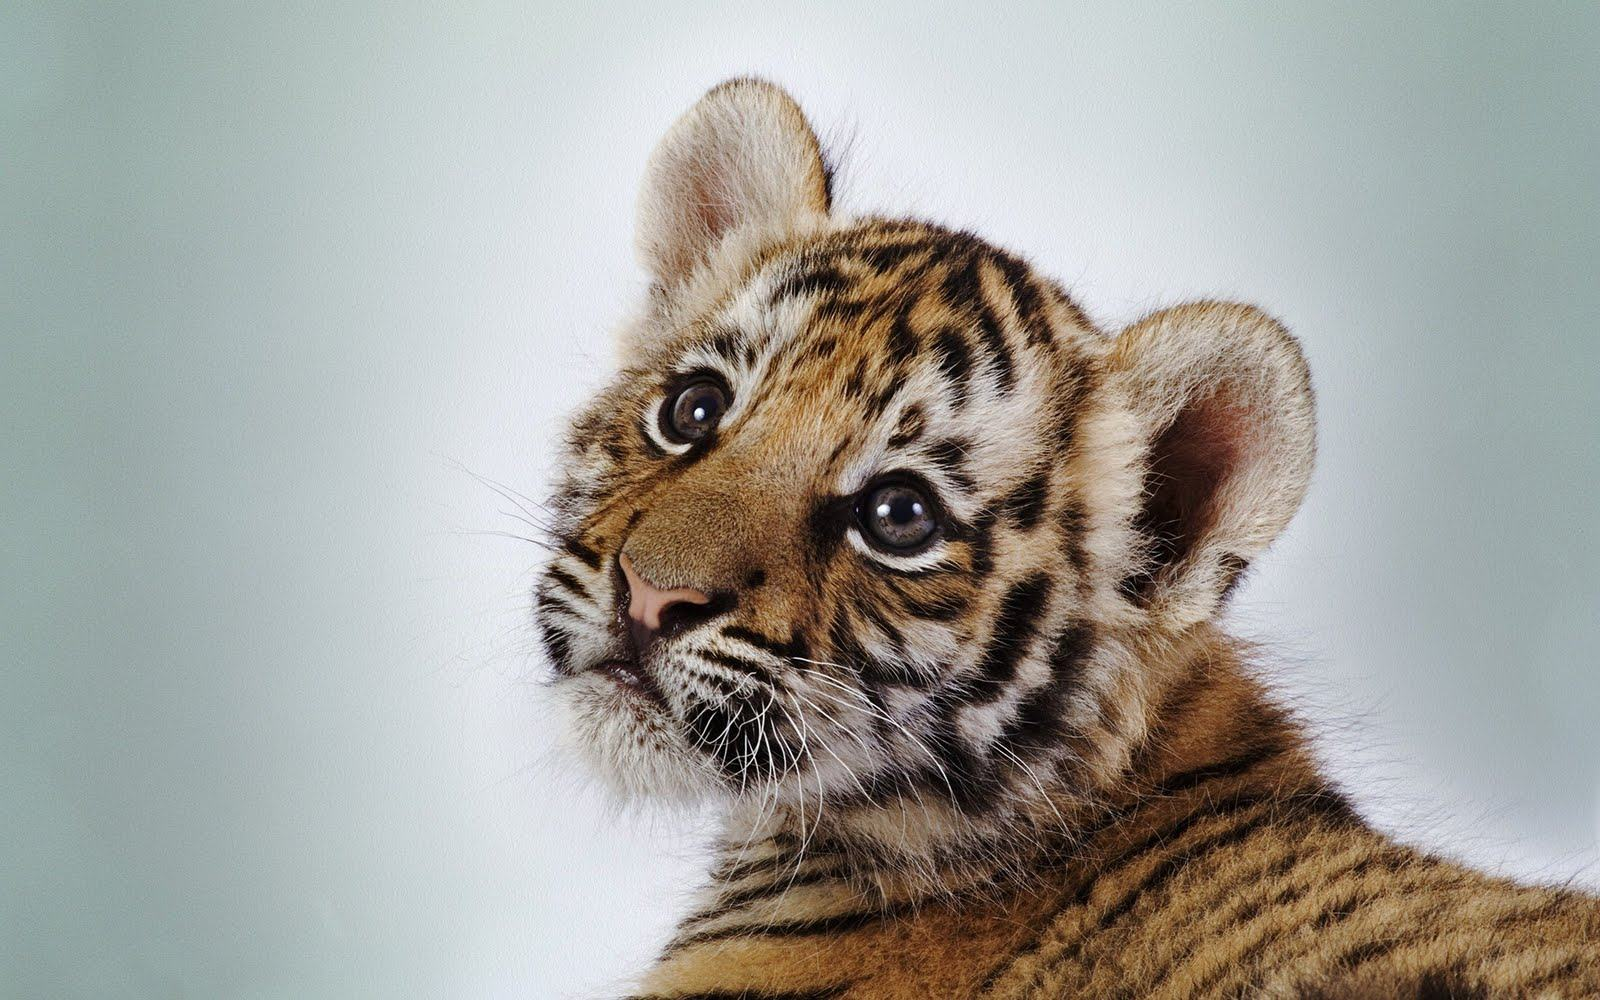 Animal Wallpaper Download Hd Cute Baby Animal Backgrounds Pixelstalk Baby Animals